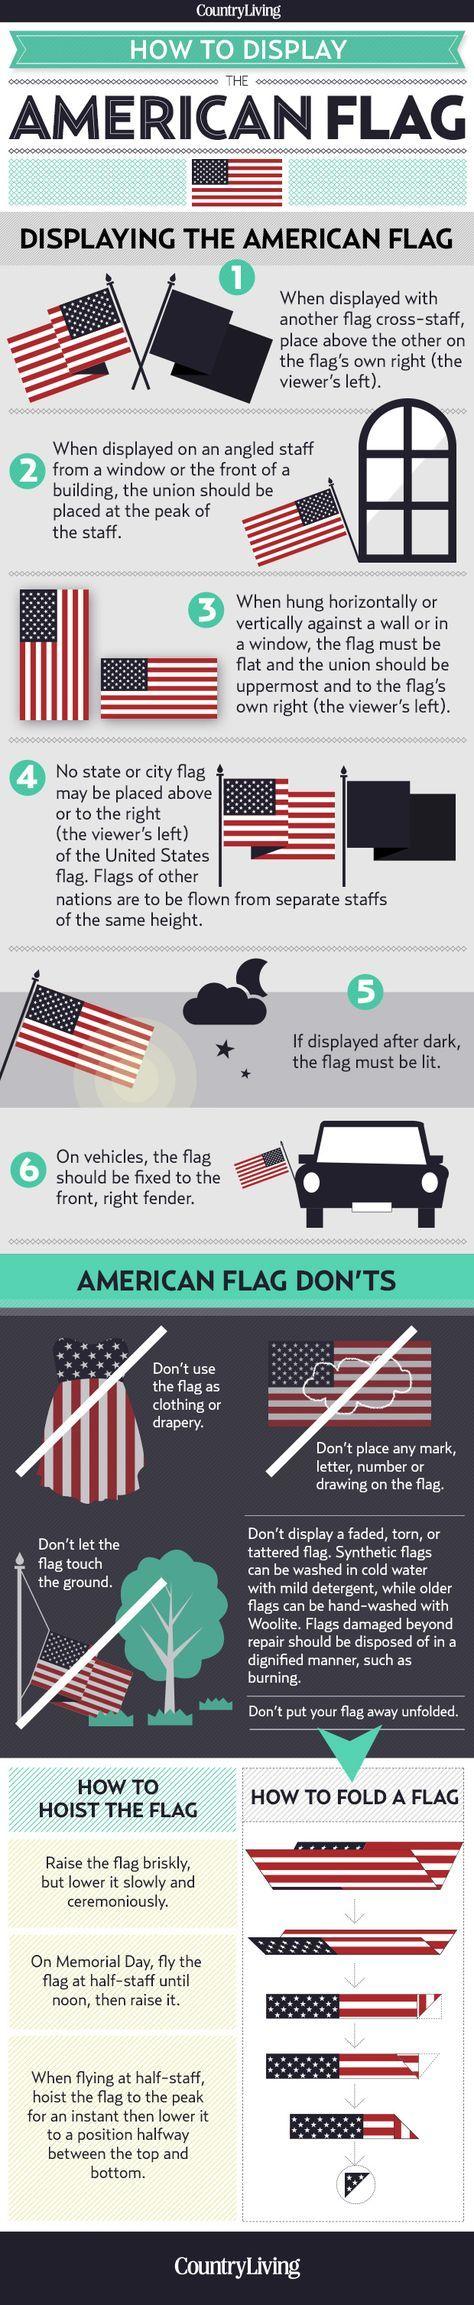 17 best ideas about us flag etiquette on pinterest flag protocol pledge of allegiance history. Black Bedroom Furniture Sets. Home Design Ideas